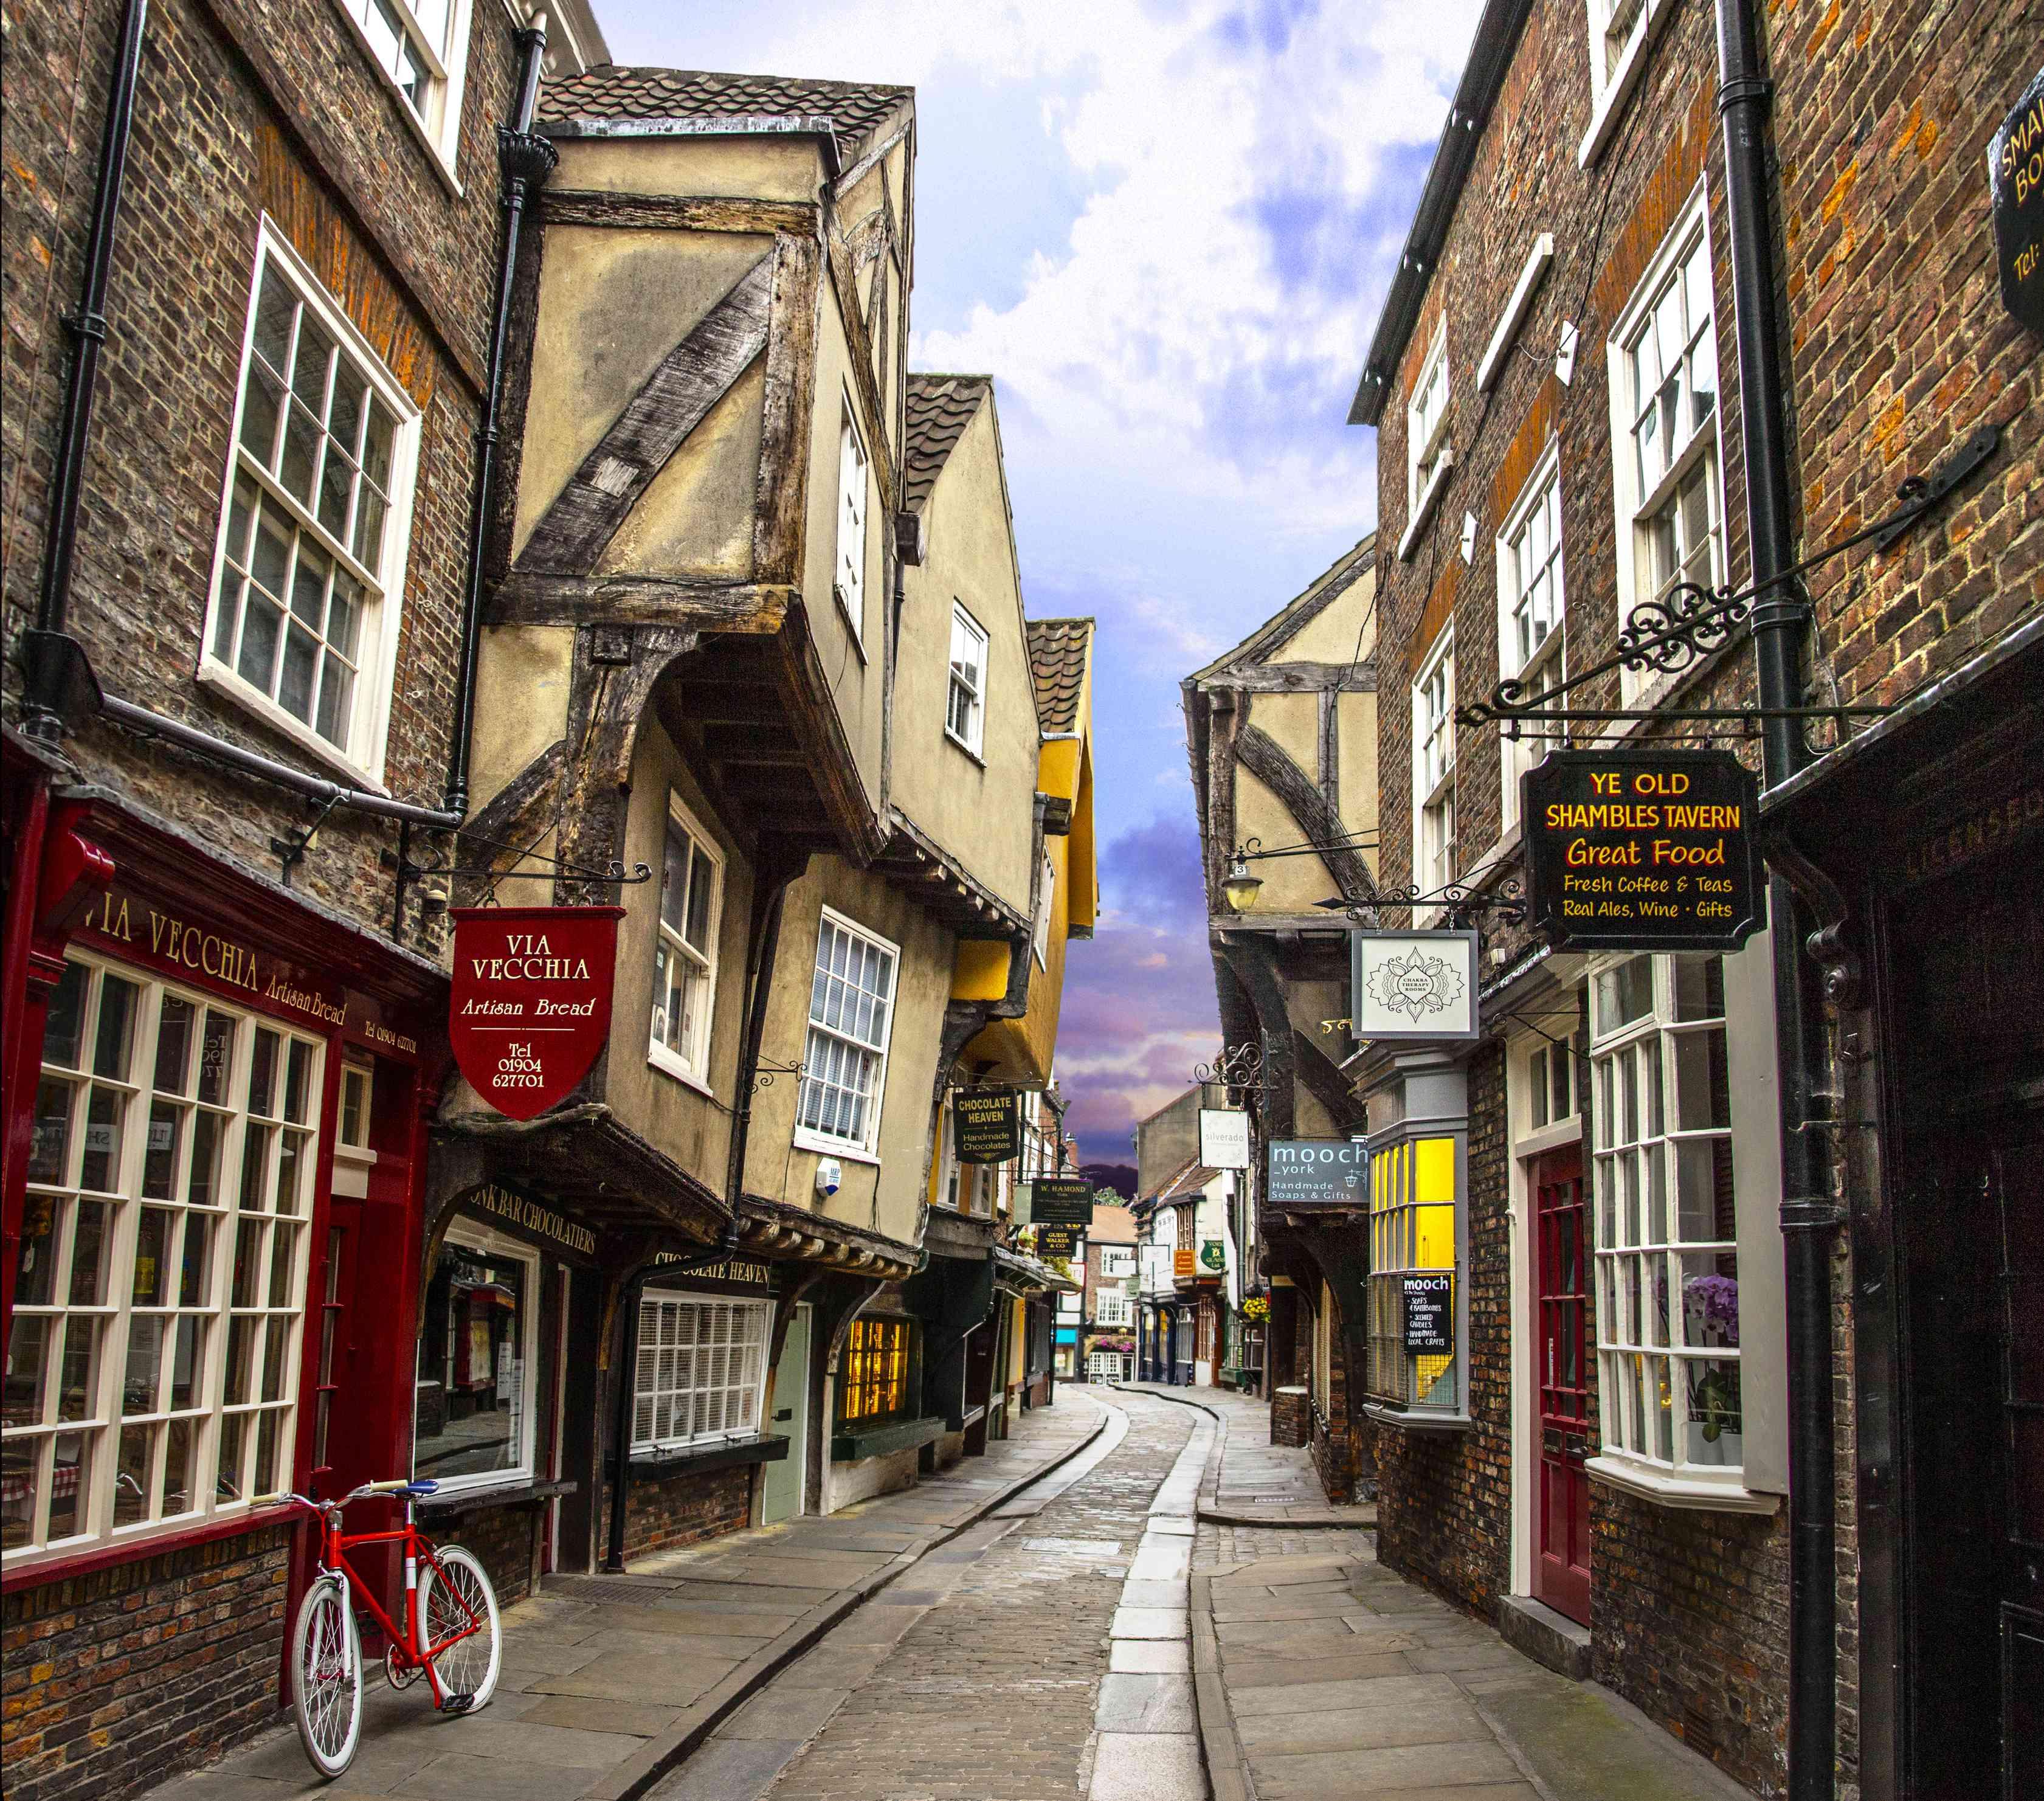 The Shambles, York, Yorkshire, England